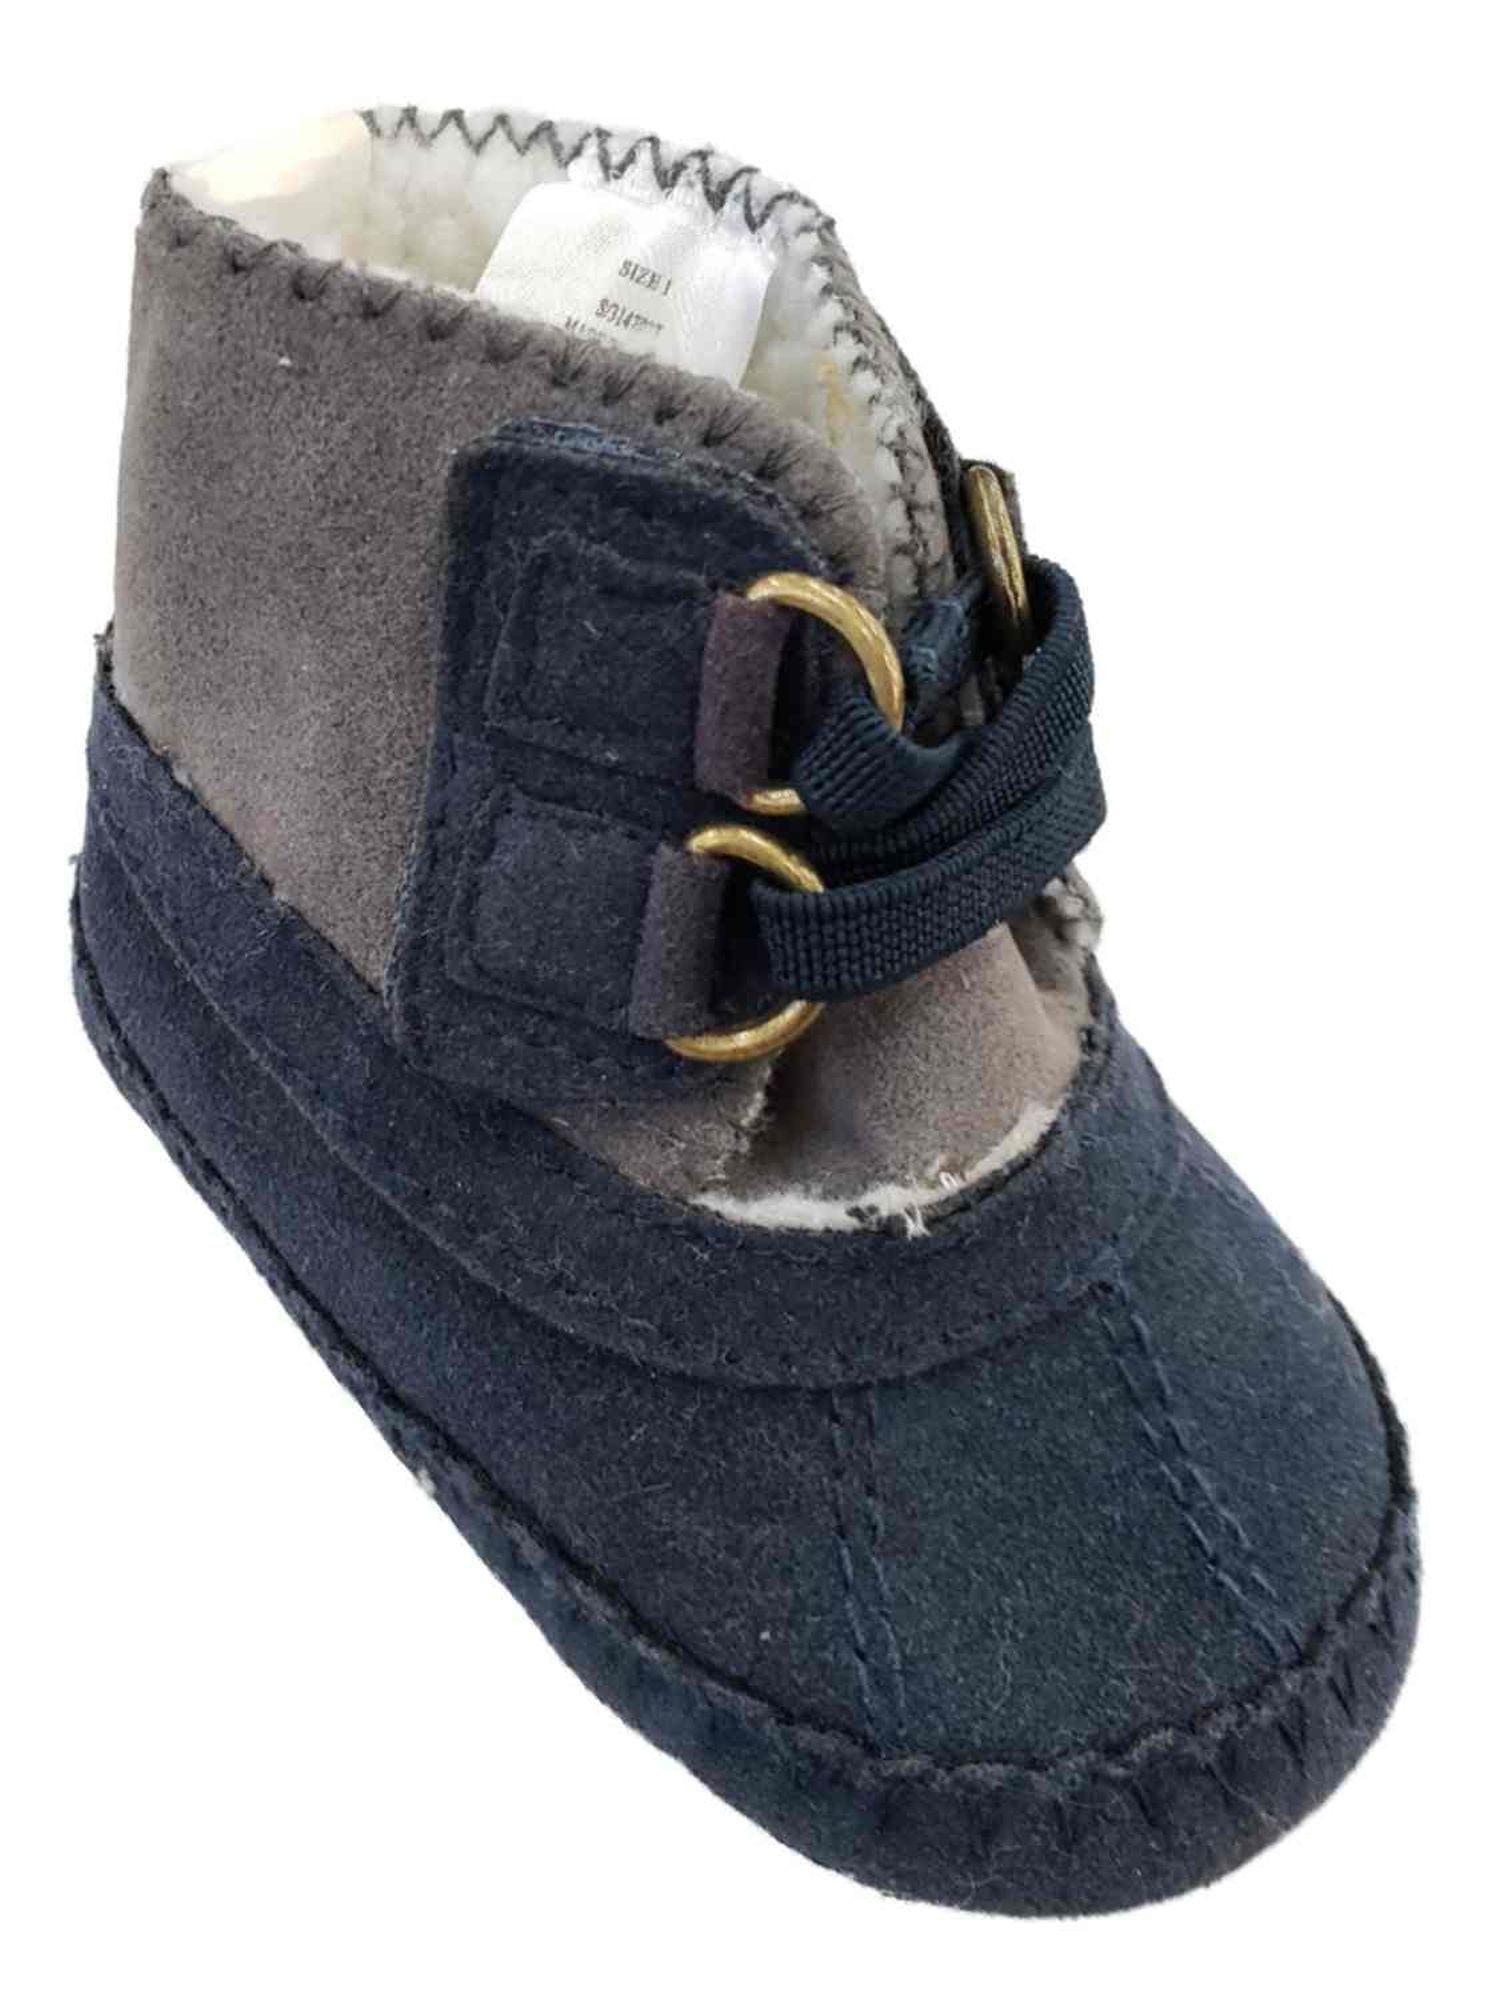 Infant Baby Boys Navy Blue \u0026 Grey Lined